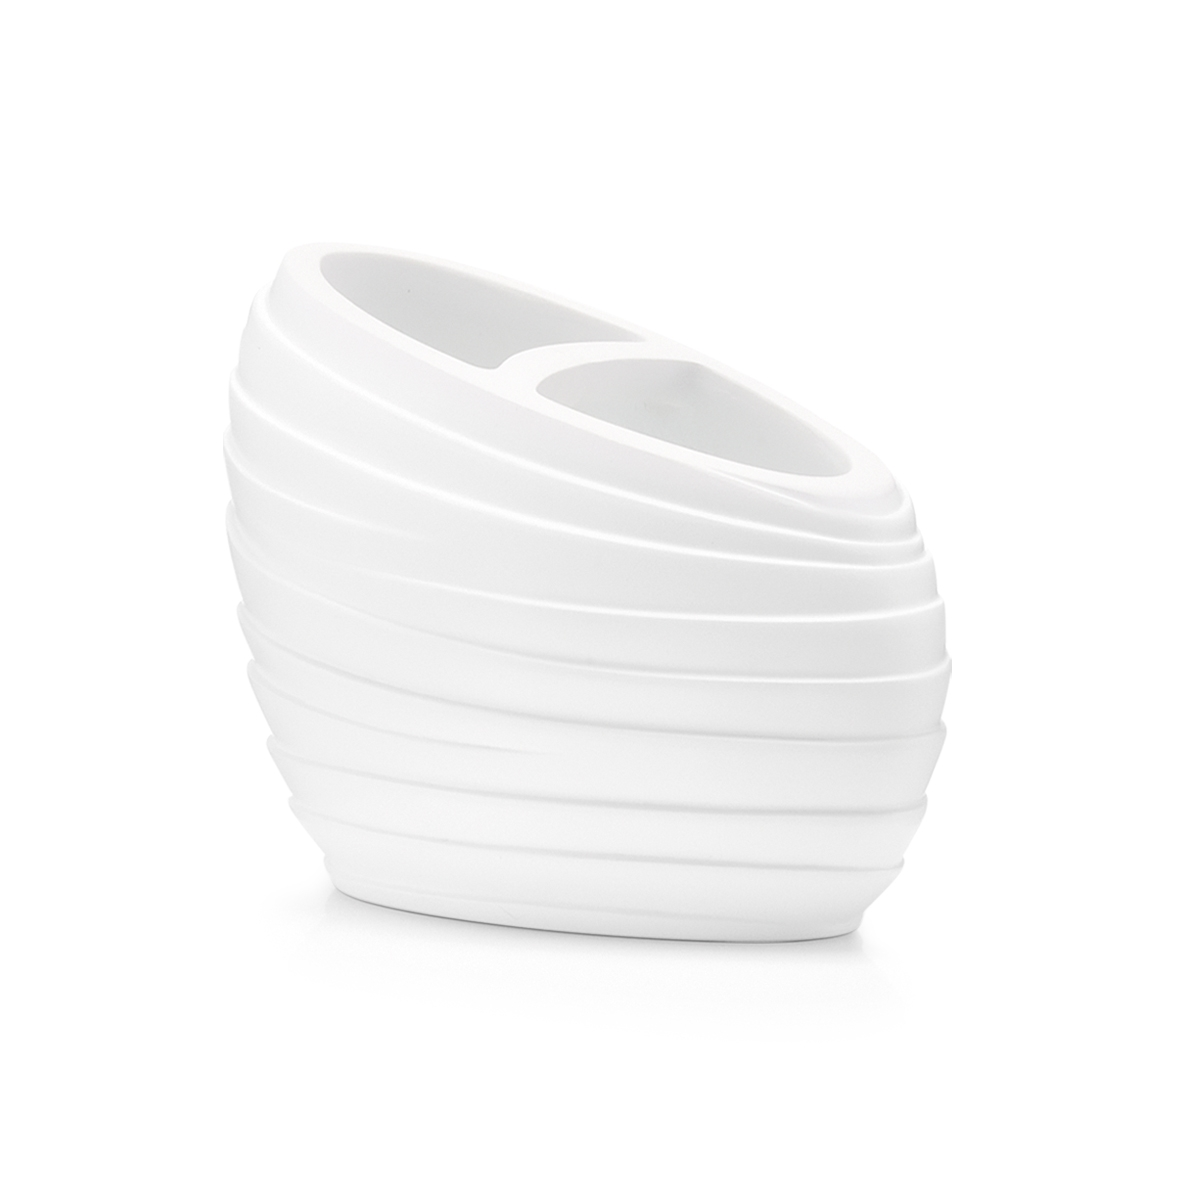 Suport pentru periuta din polirasina, Abstrakt White, l12,5xA6,5xH8,9 cm imagine